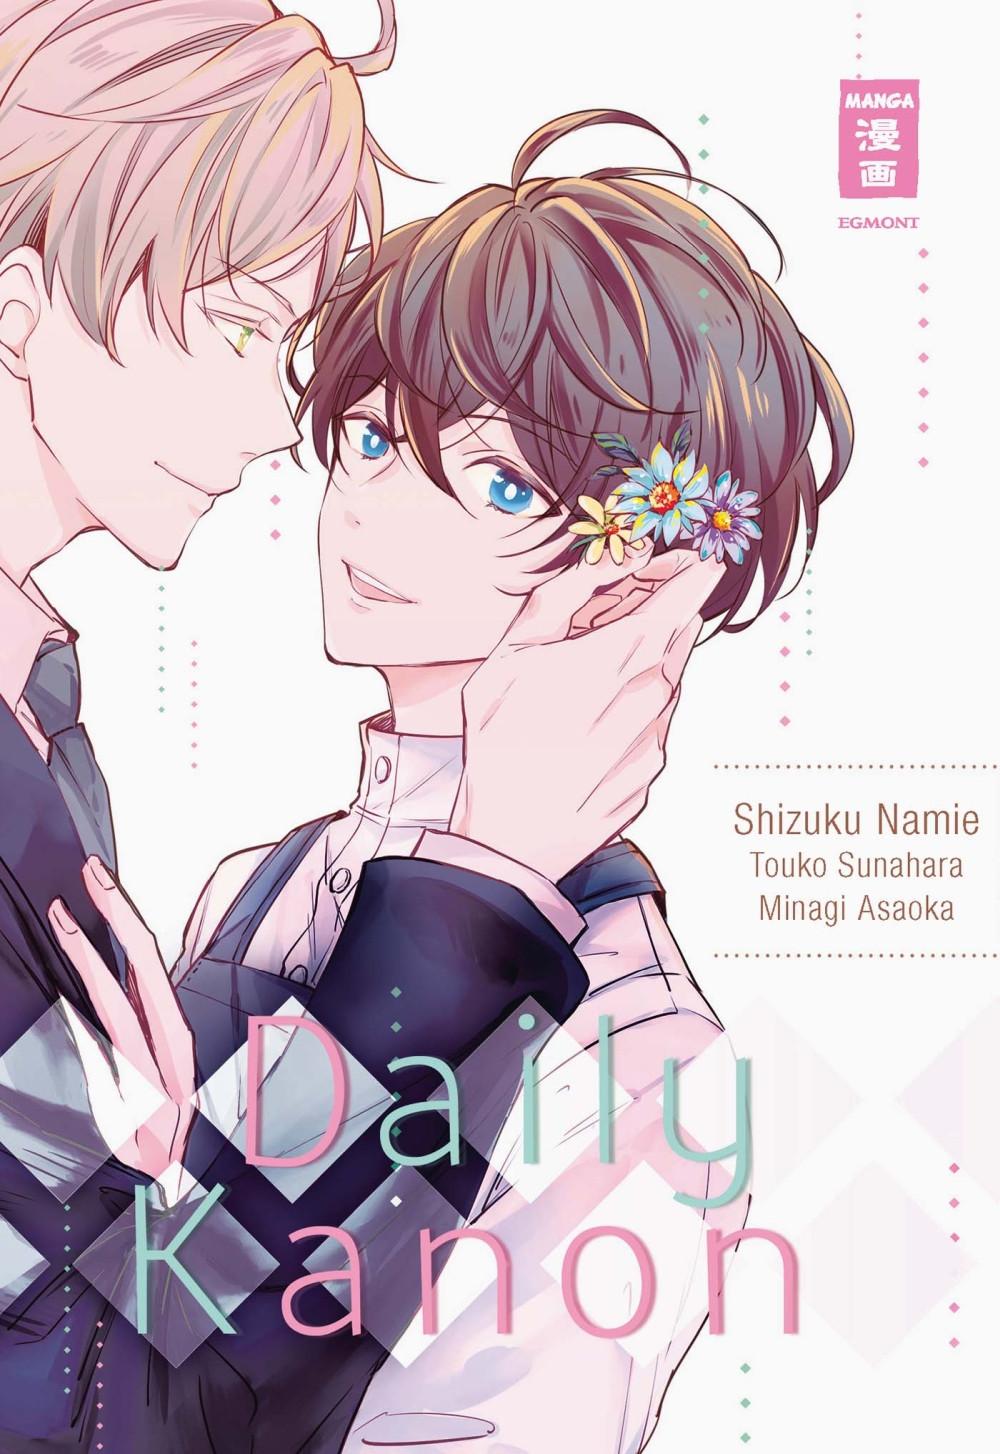 Daily Kanon Manga